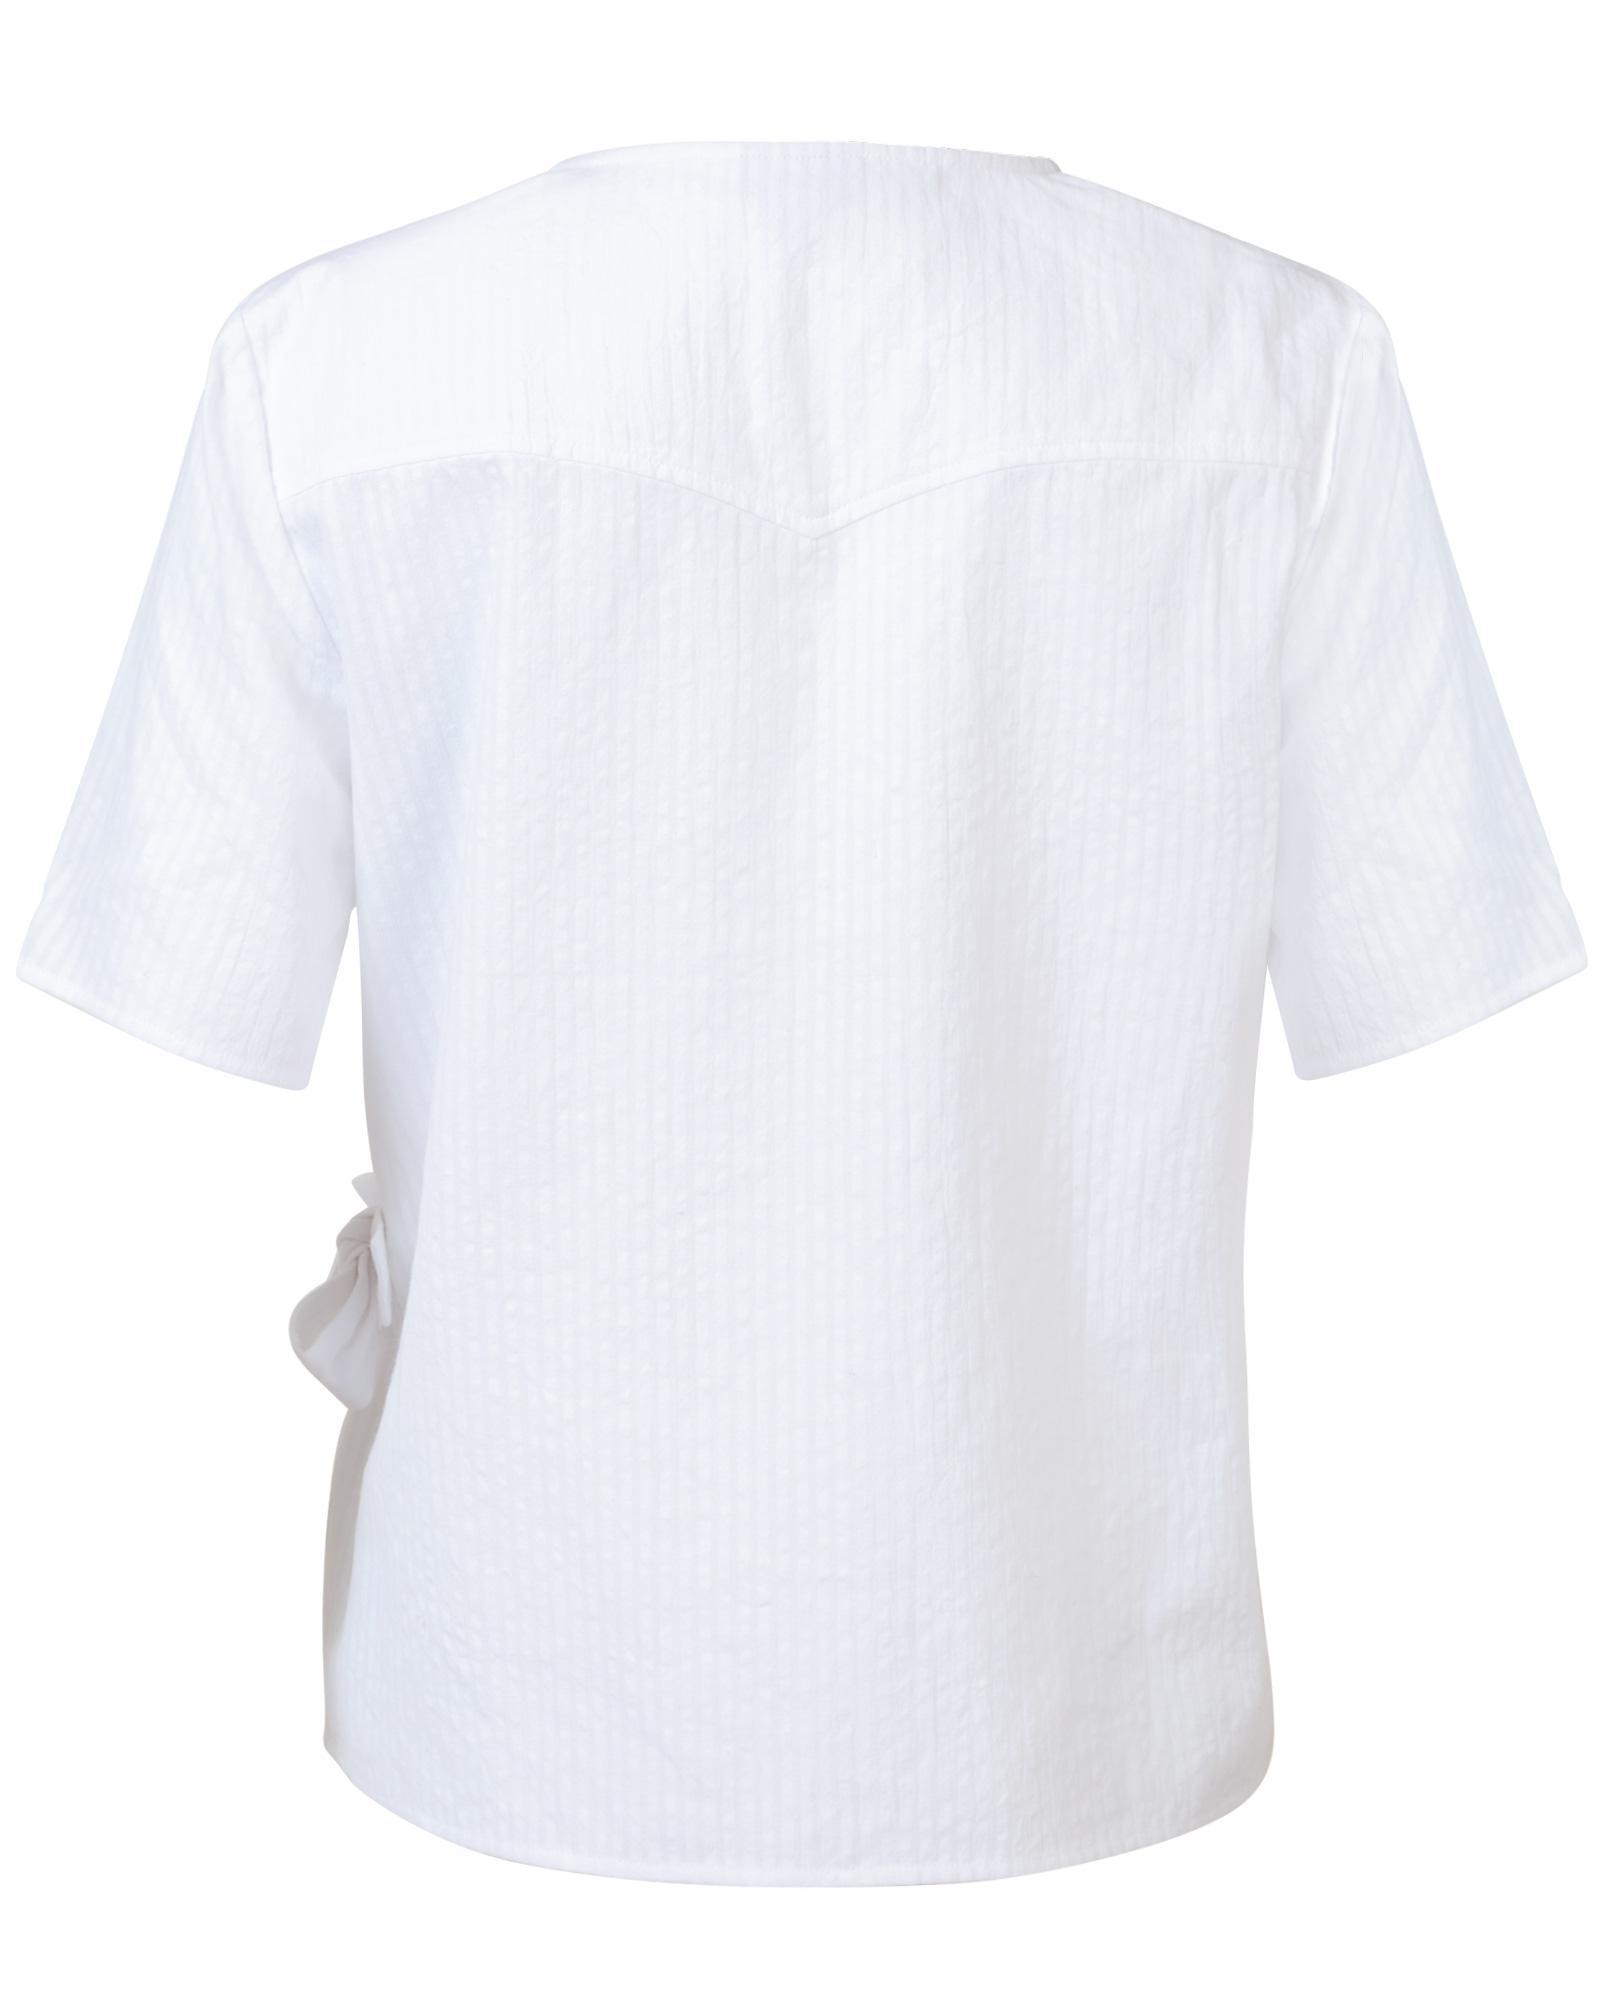 6f73bdd2884fb2 Lyst - Oliver Bonas Wanderlust White Cotton Wrap Top in White